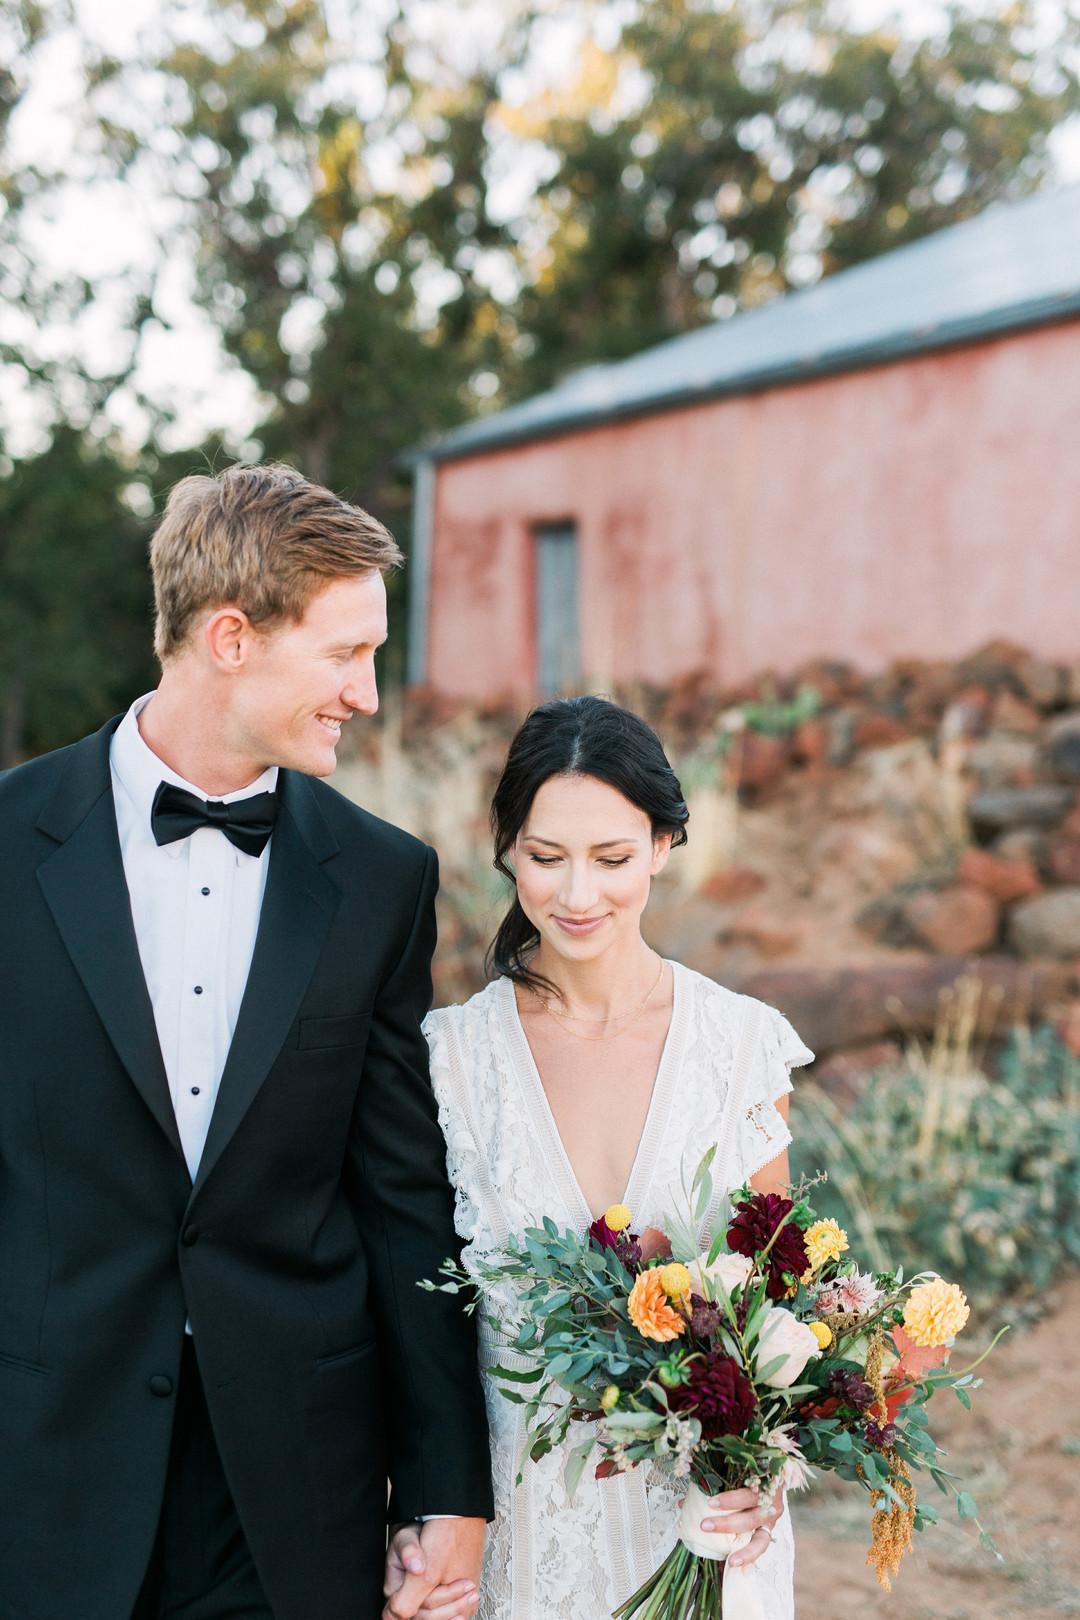 bröllop+inspiration+blogg+boho